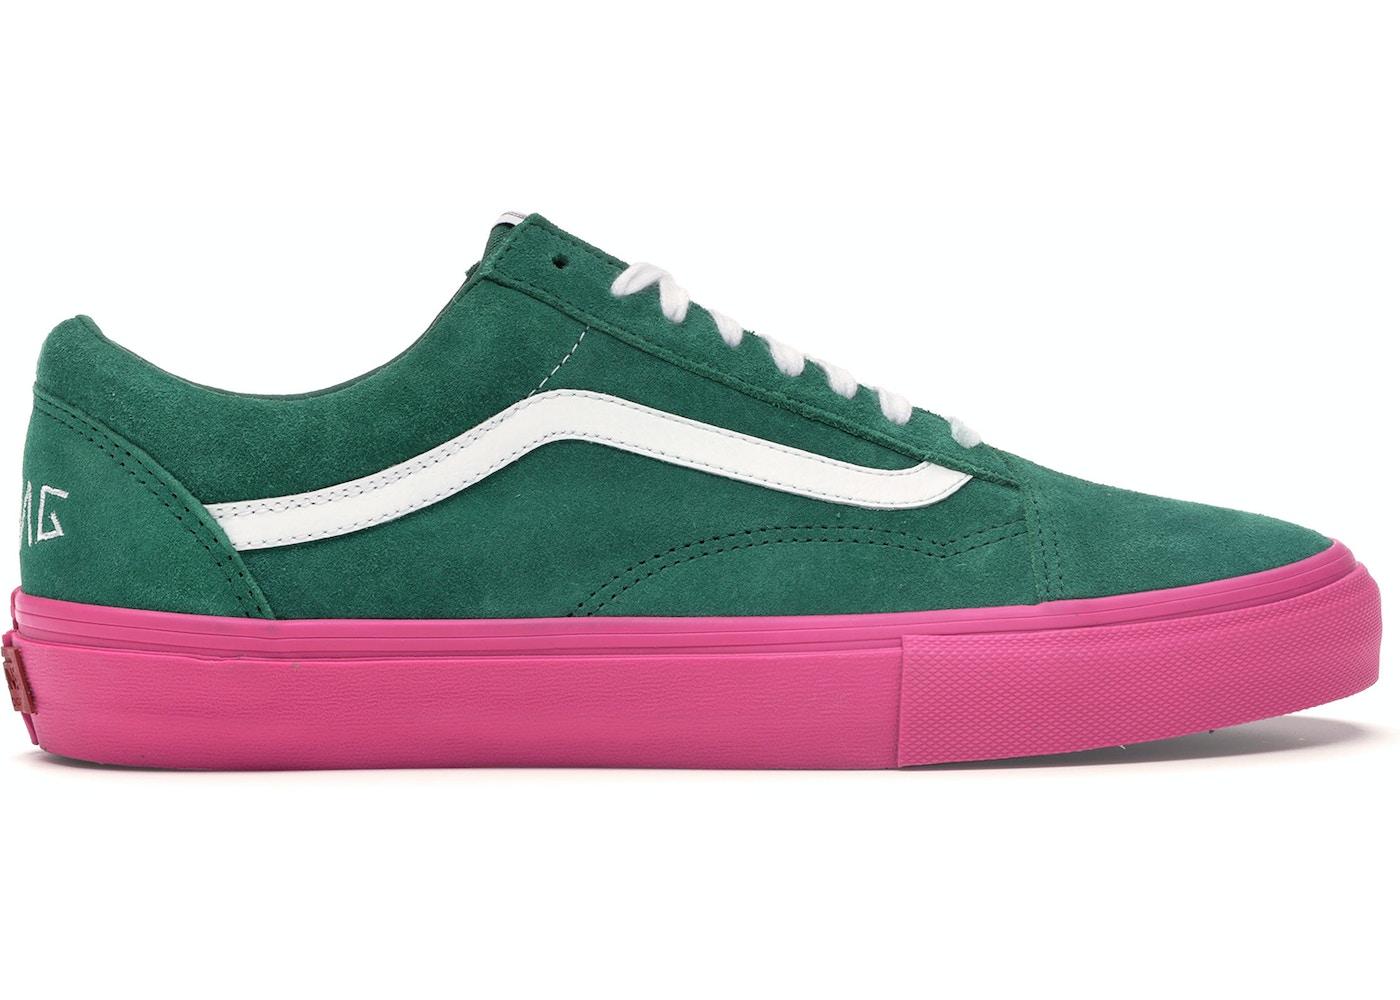 5b7d514fa718 Vans Old Skool Pro S Golf Wang Green Pink - VN0QHMF5G